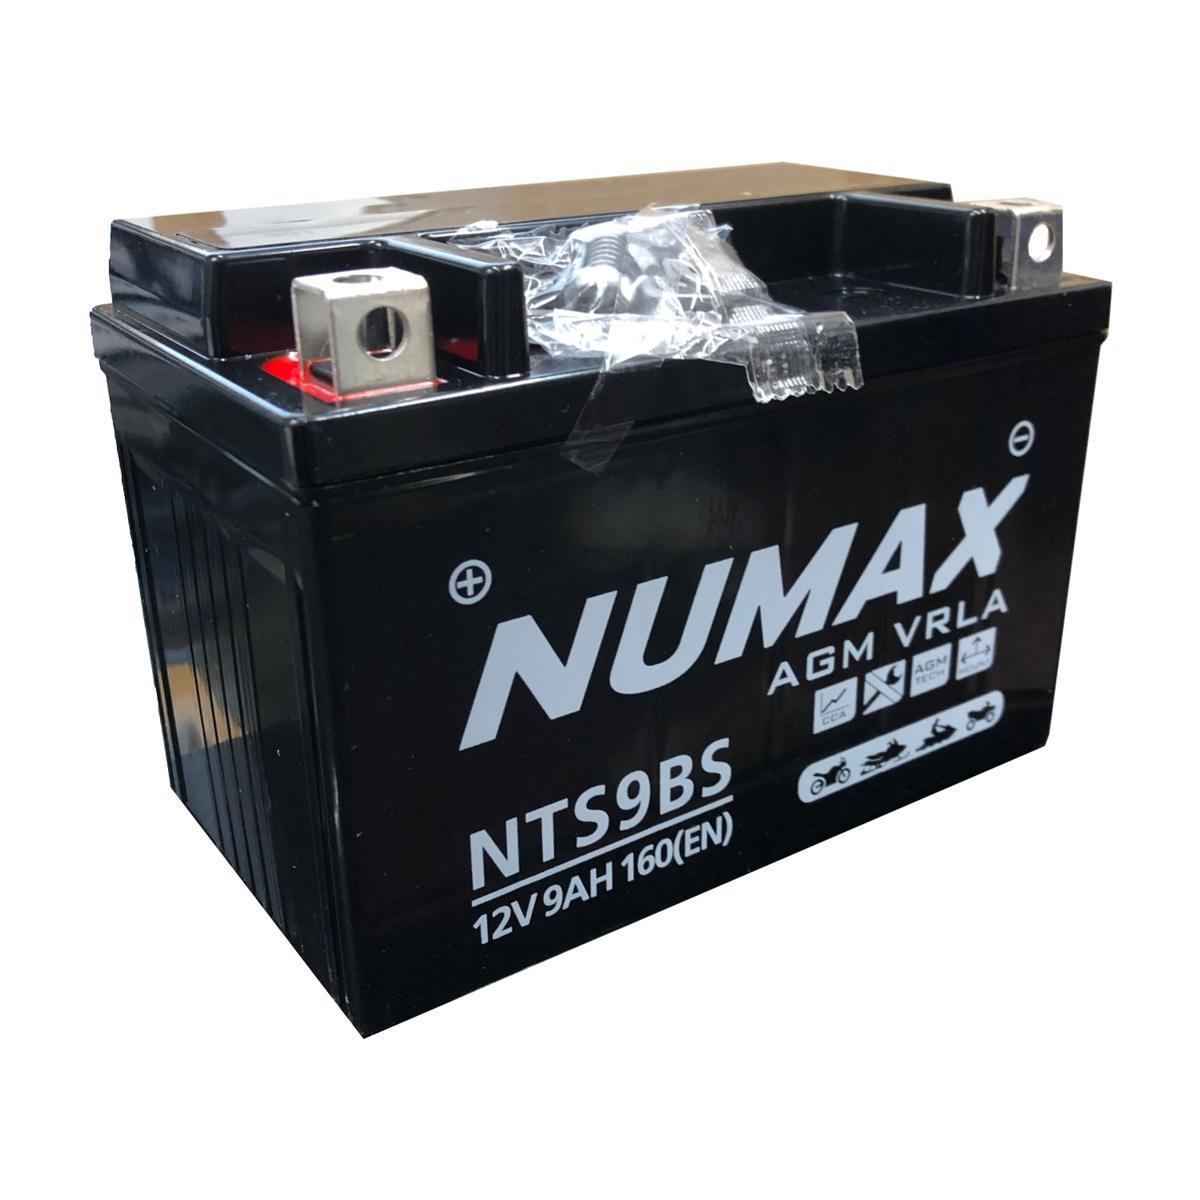 Numax NTS9BS 12v Motorbike Bike Battery BETAMOTOR 50cc Eikon 2001 onward YXT9-BS